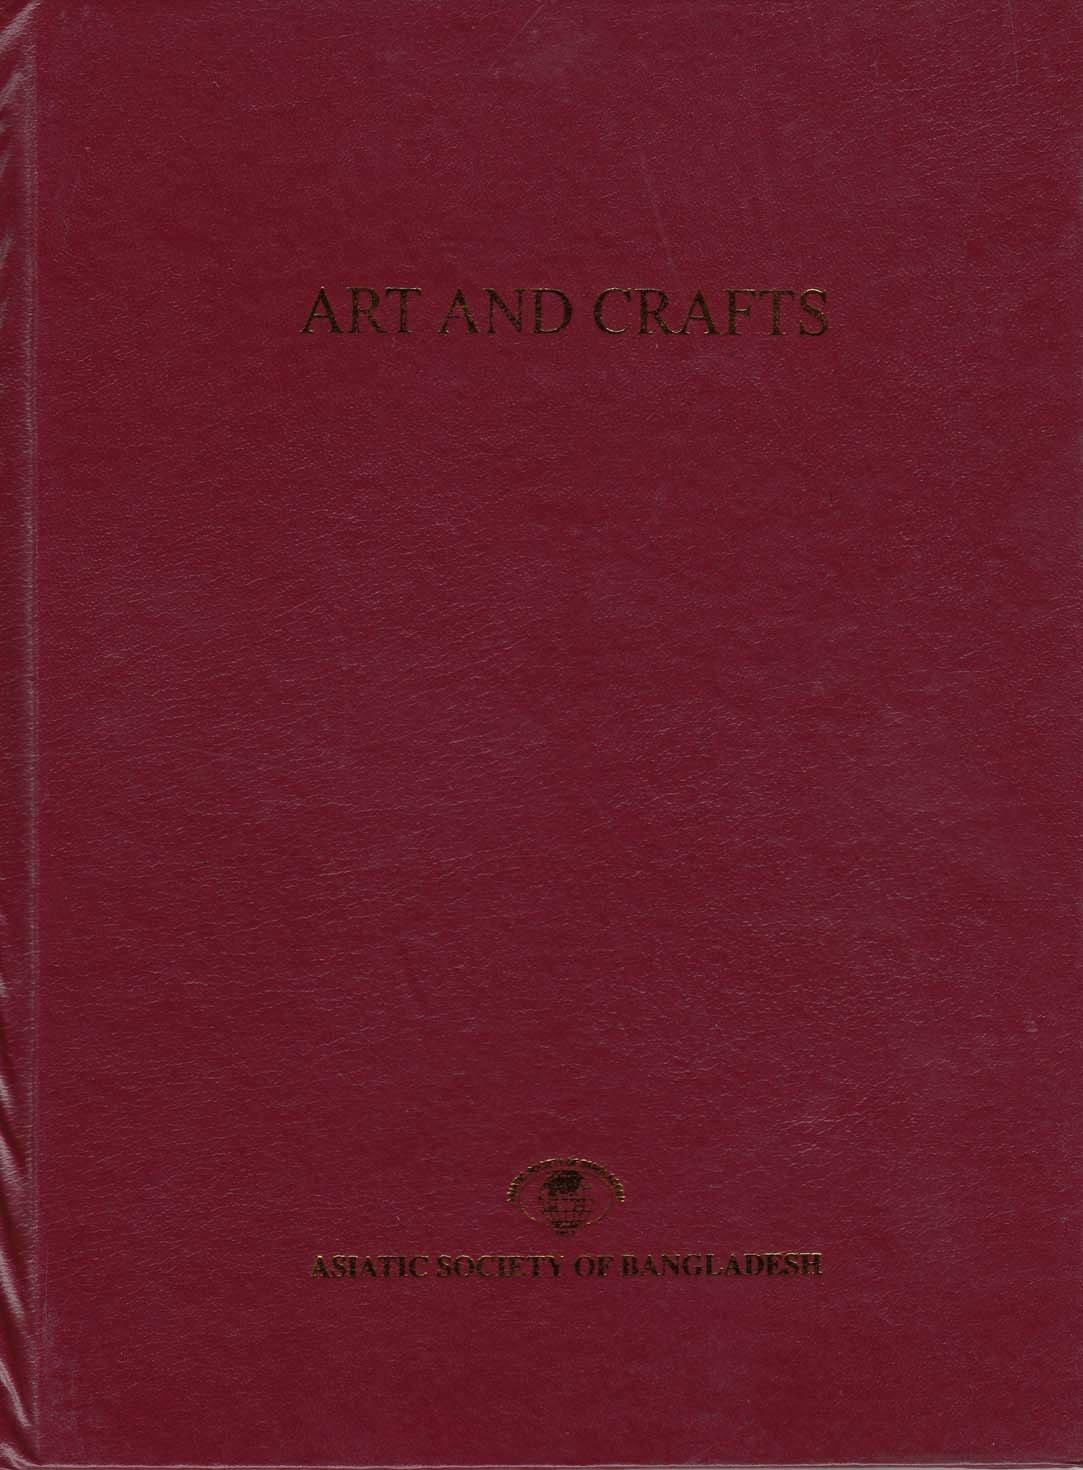 Cultural Survey of Bangladesh: Art and Crafts (Volume 8) pdf epub